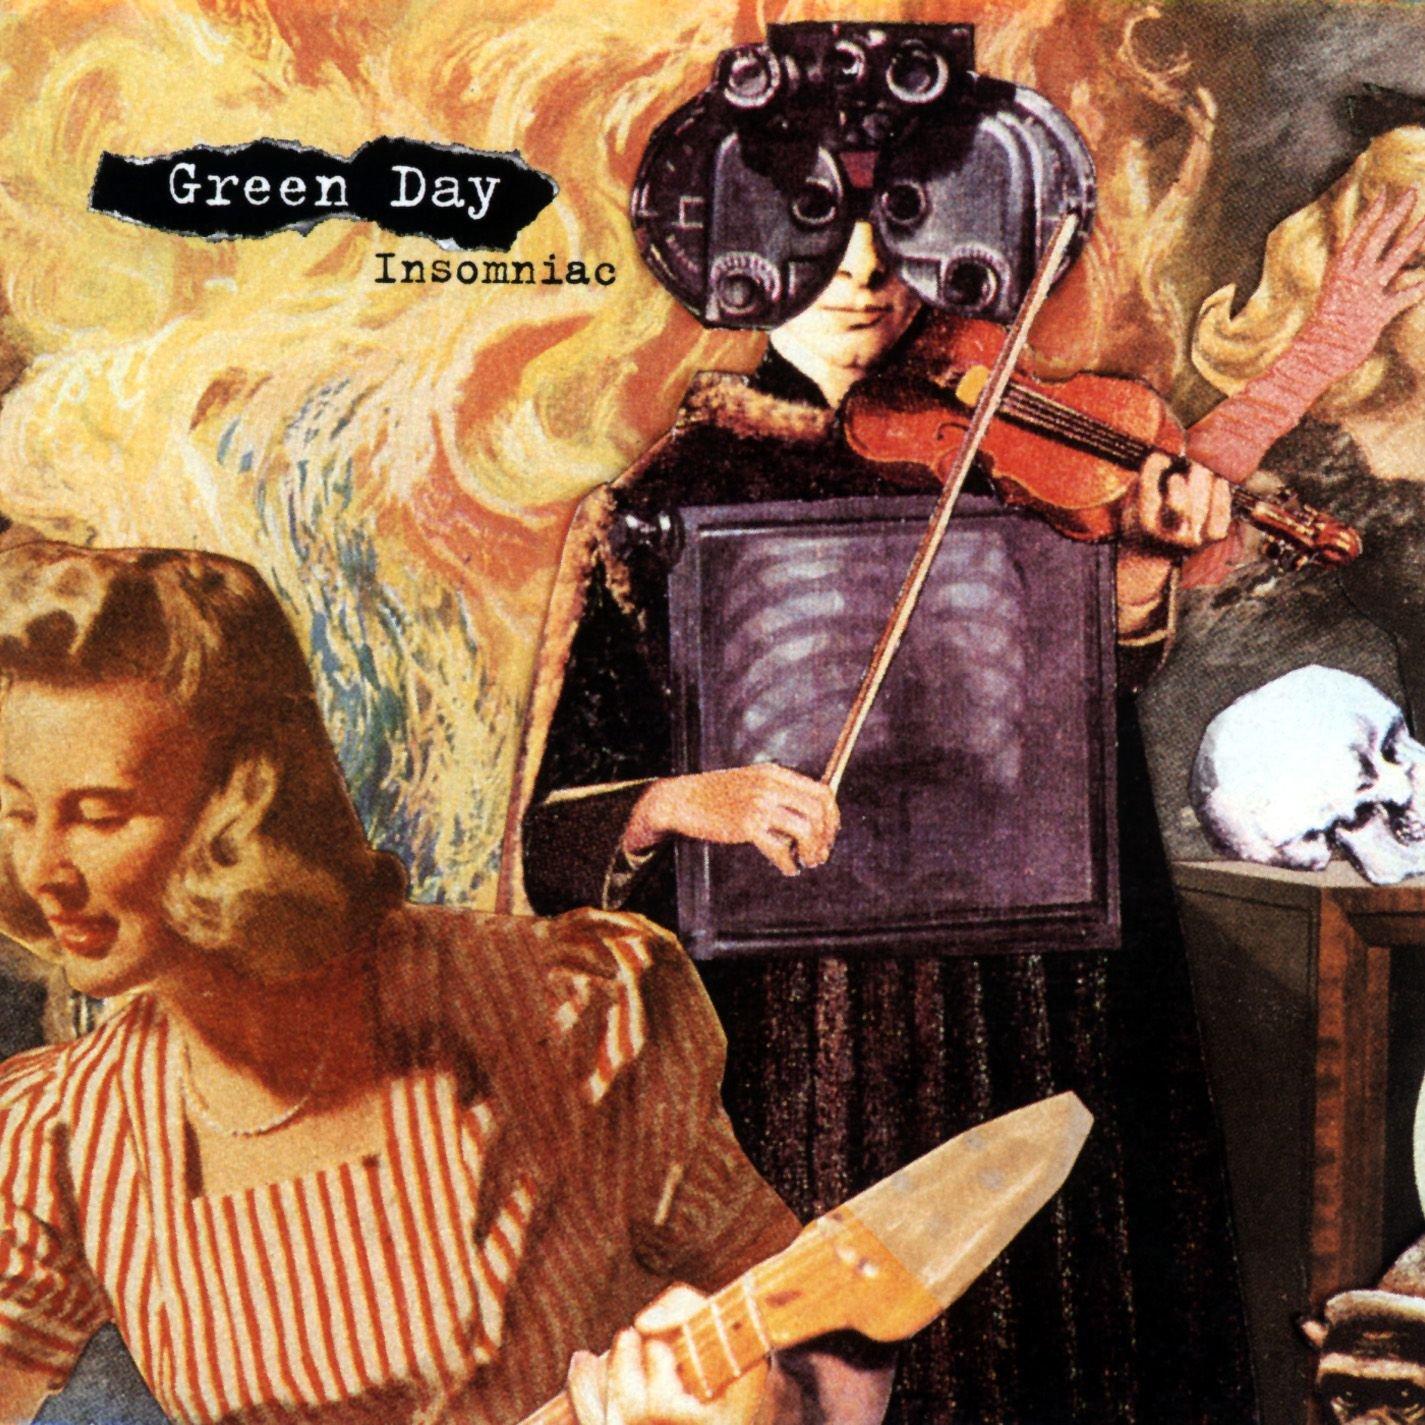 Green Day - Insomniac (1995) [FLAC] Download